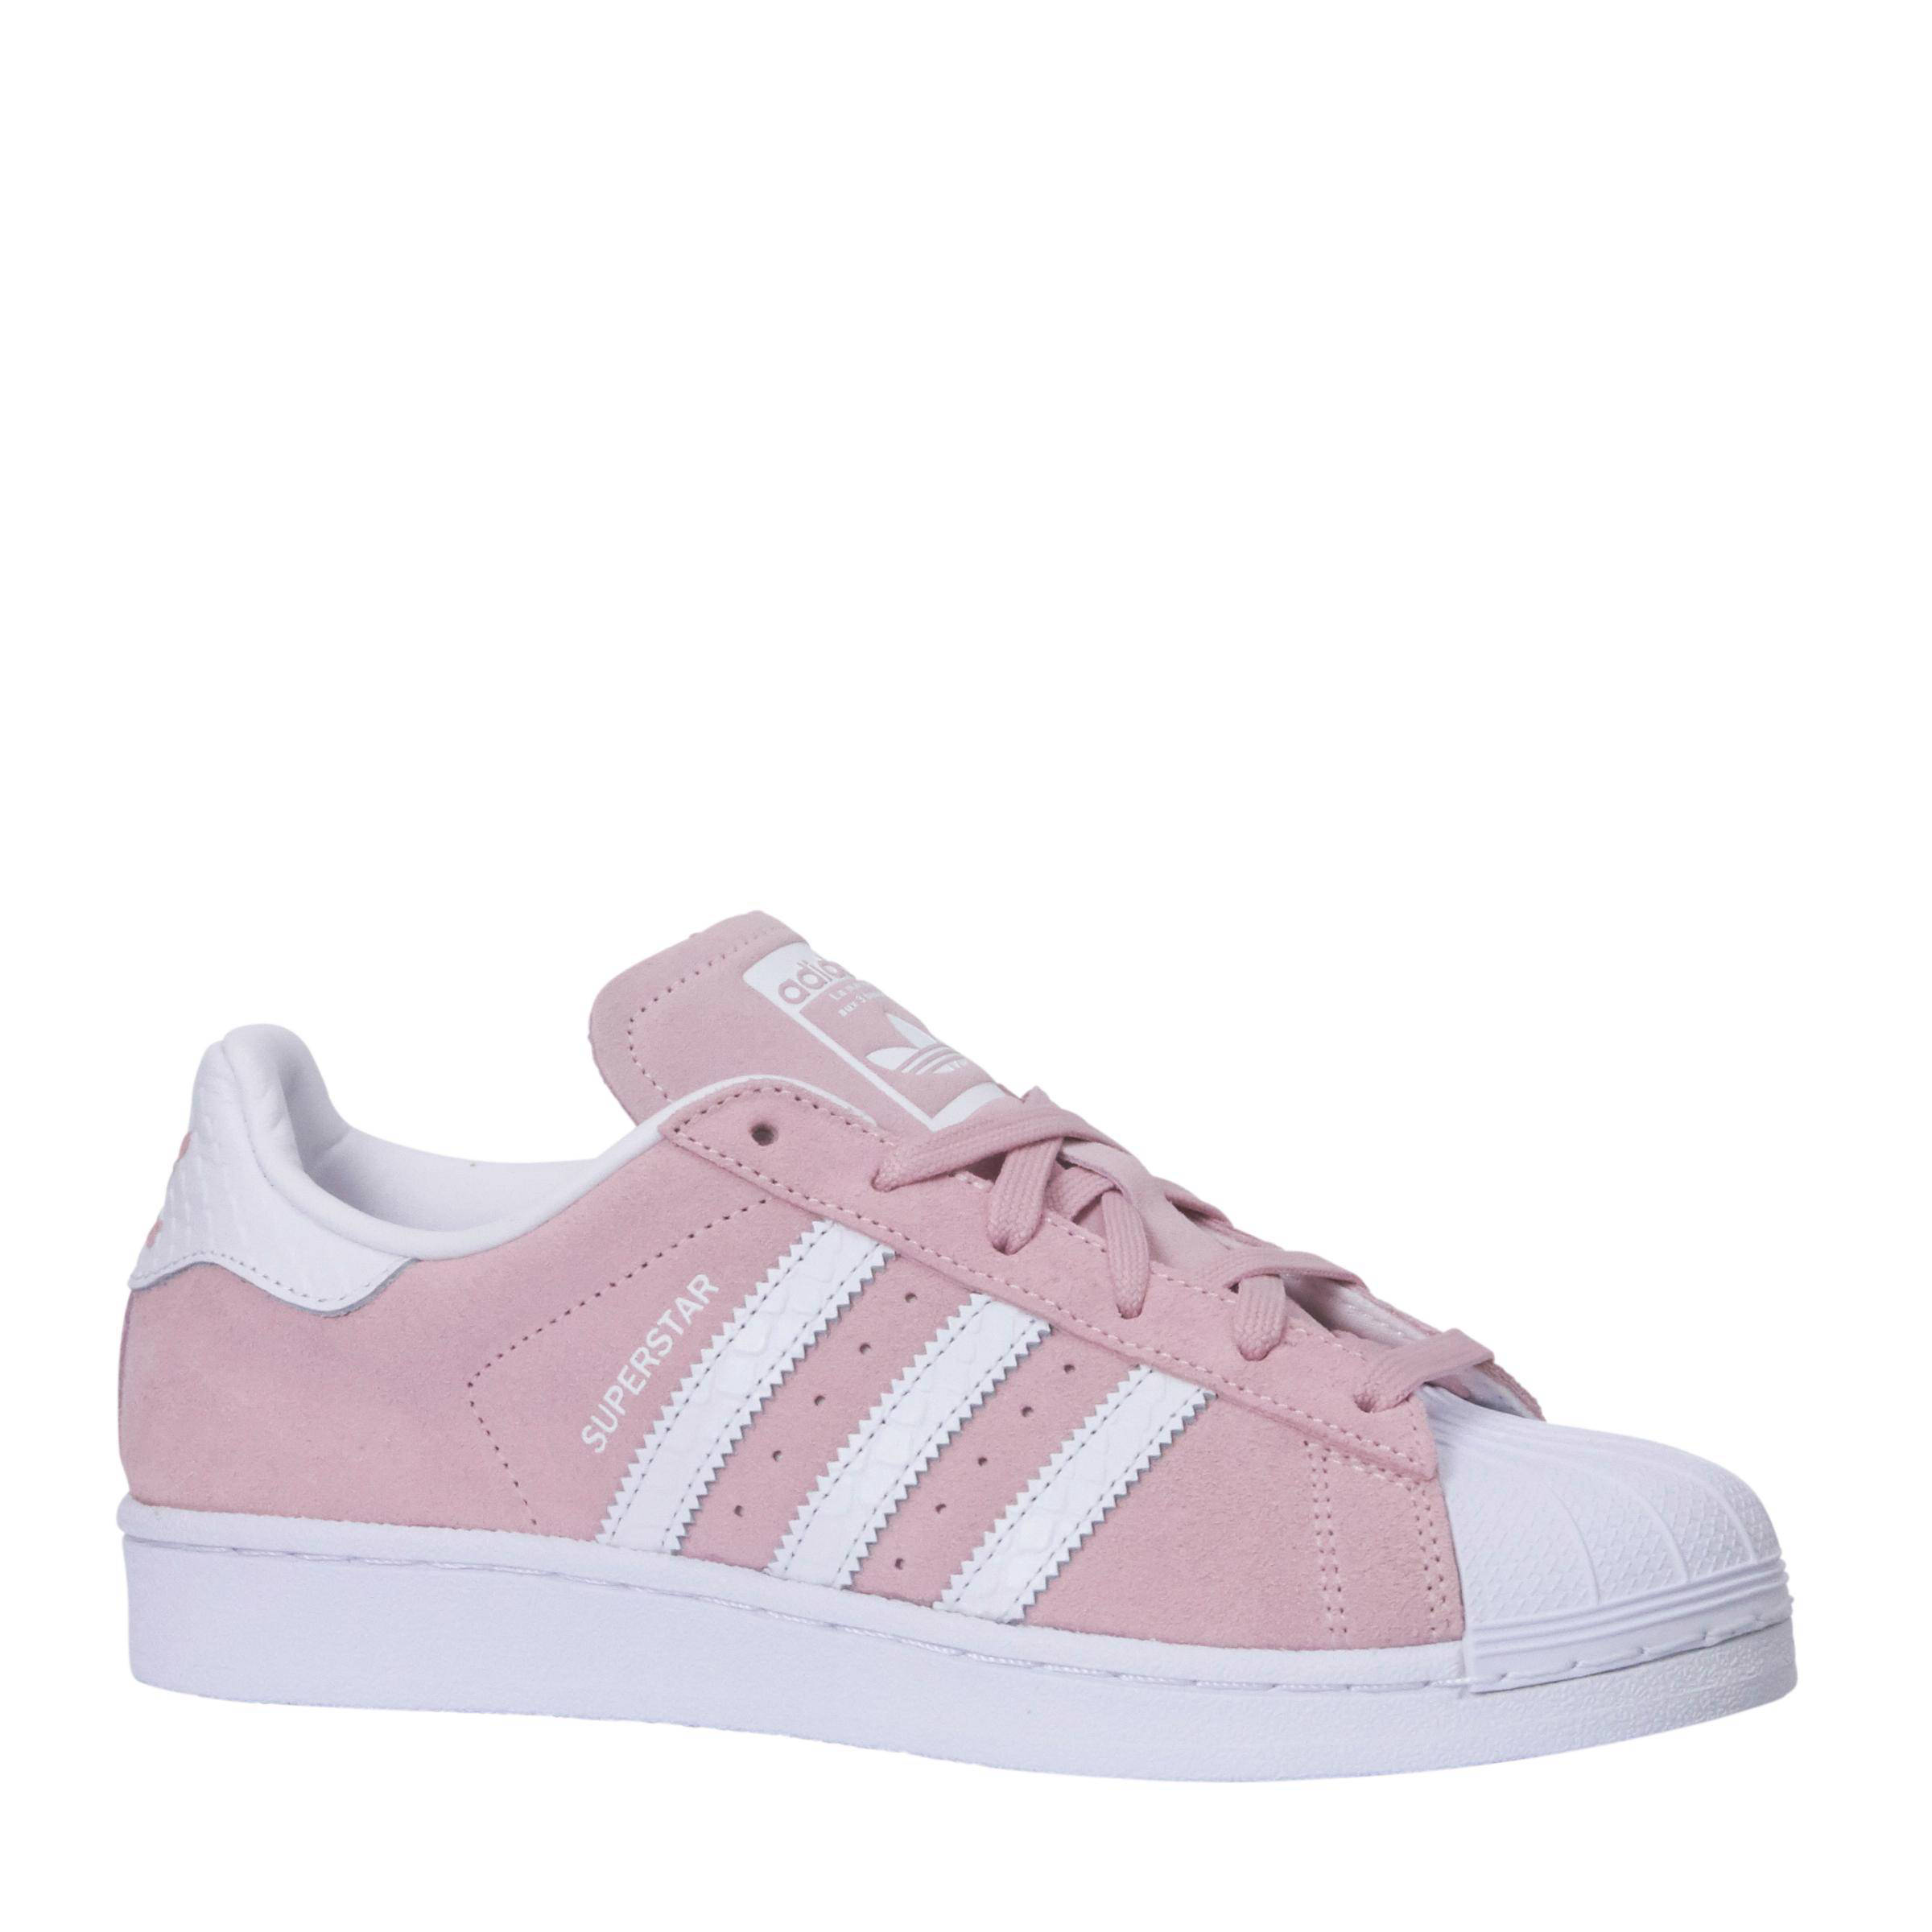 adidas superstar w schoenen roze